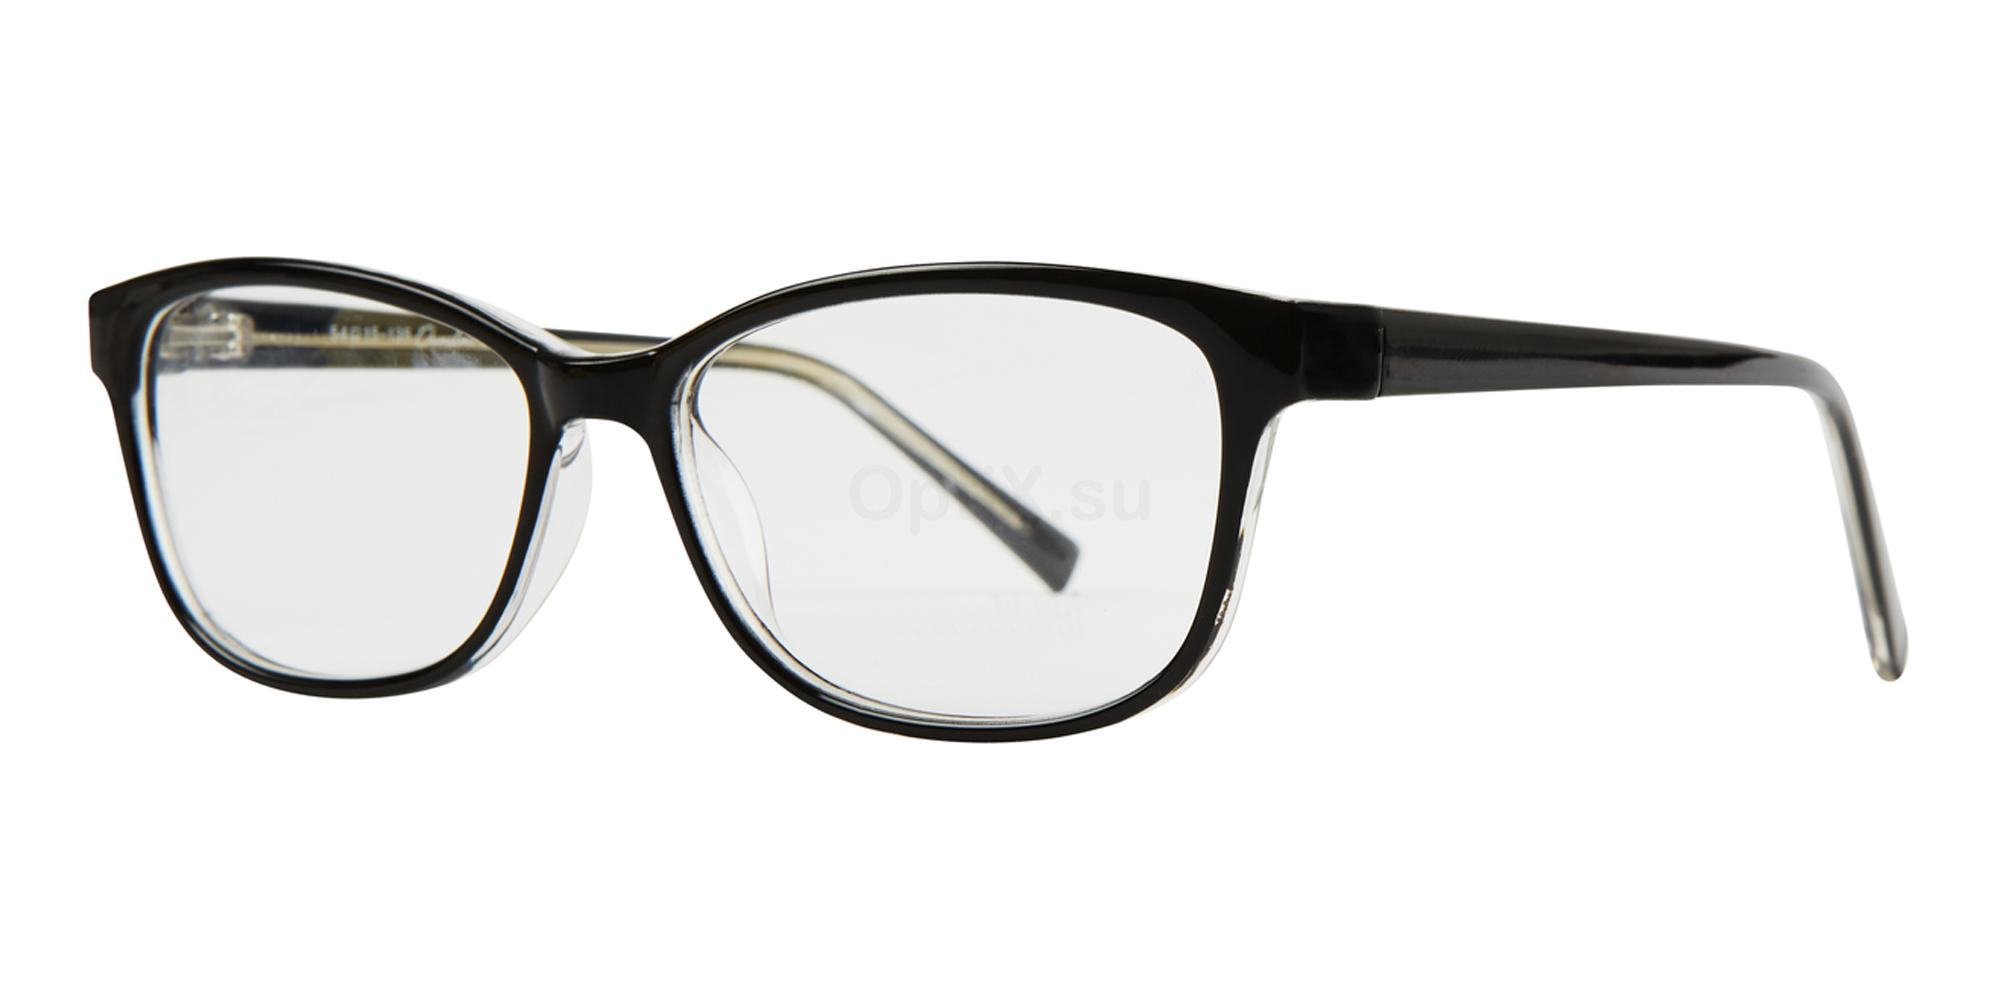 C2 Complete Mod 6 Glasses, Complete